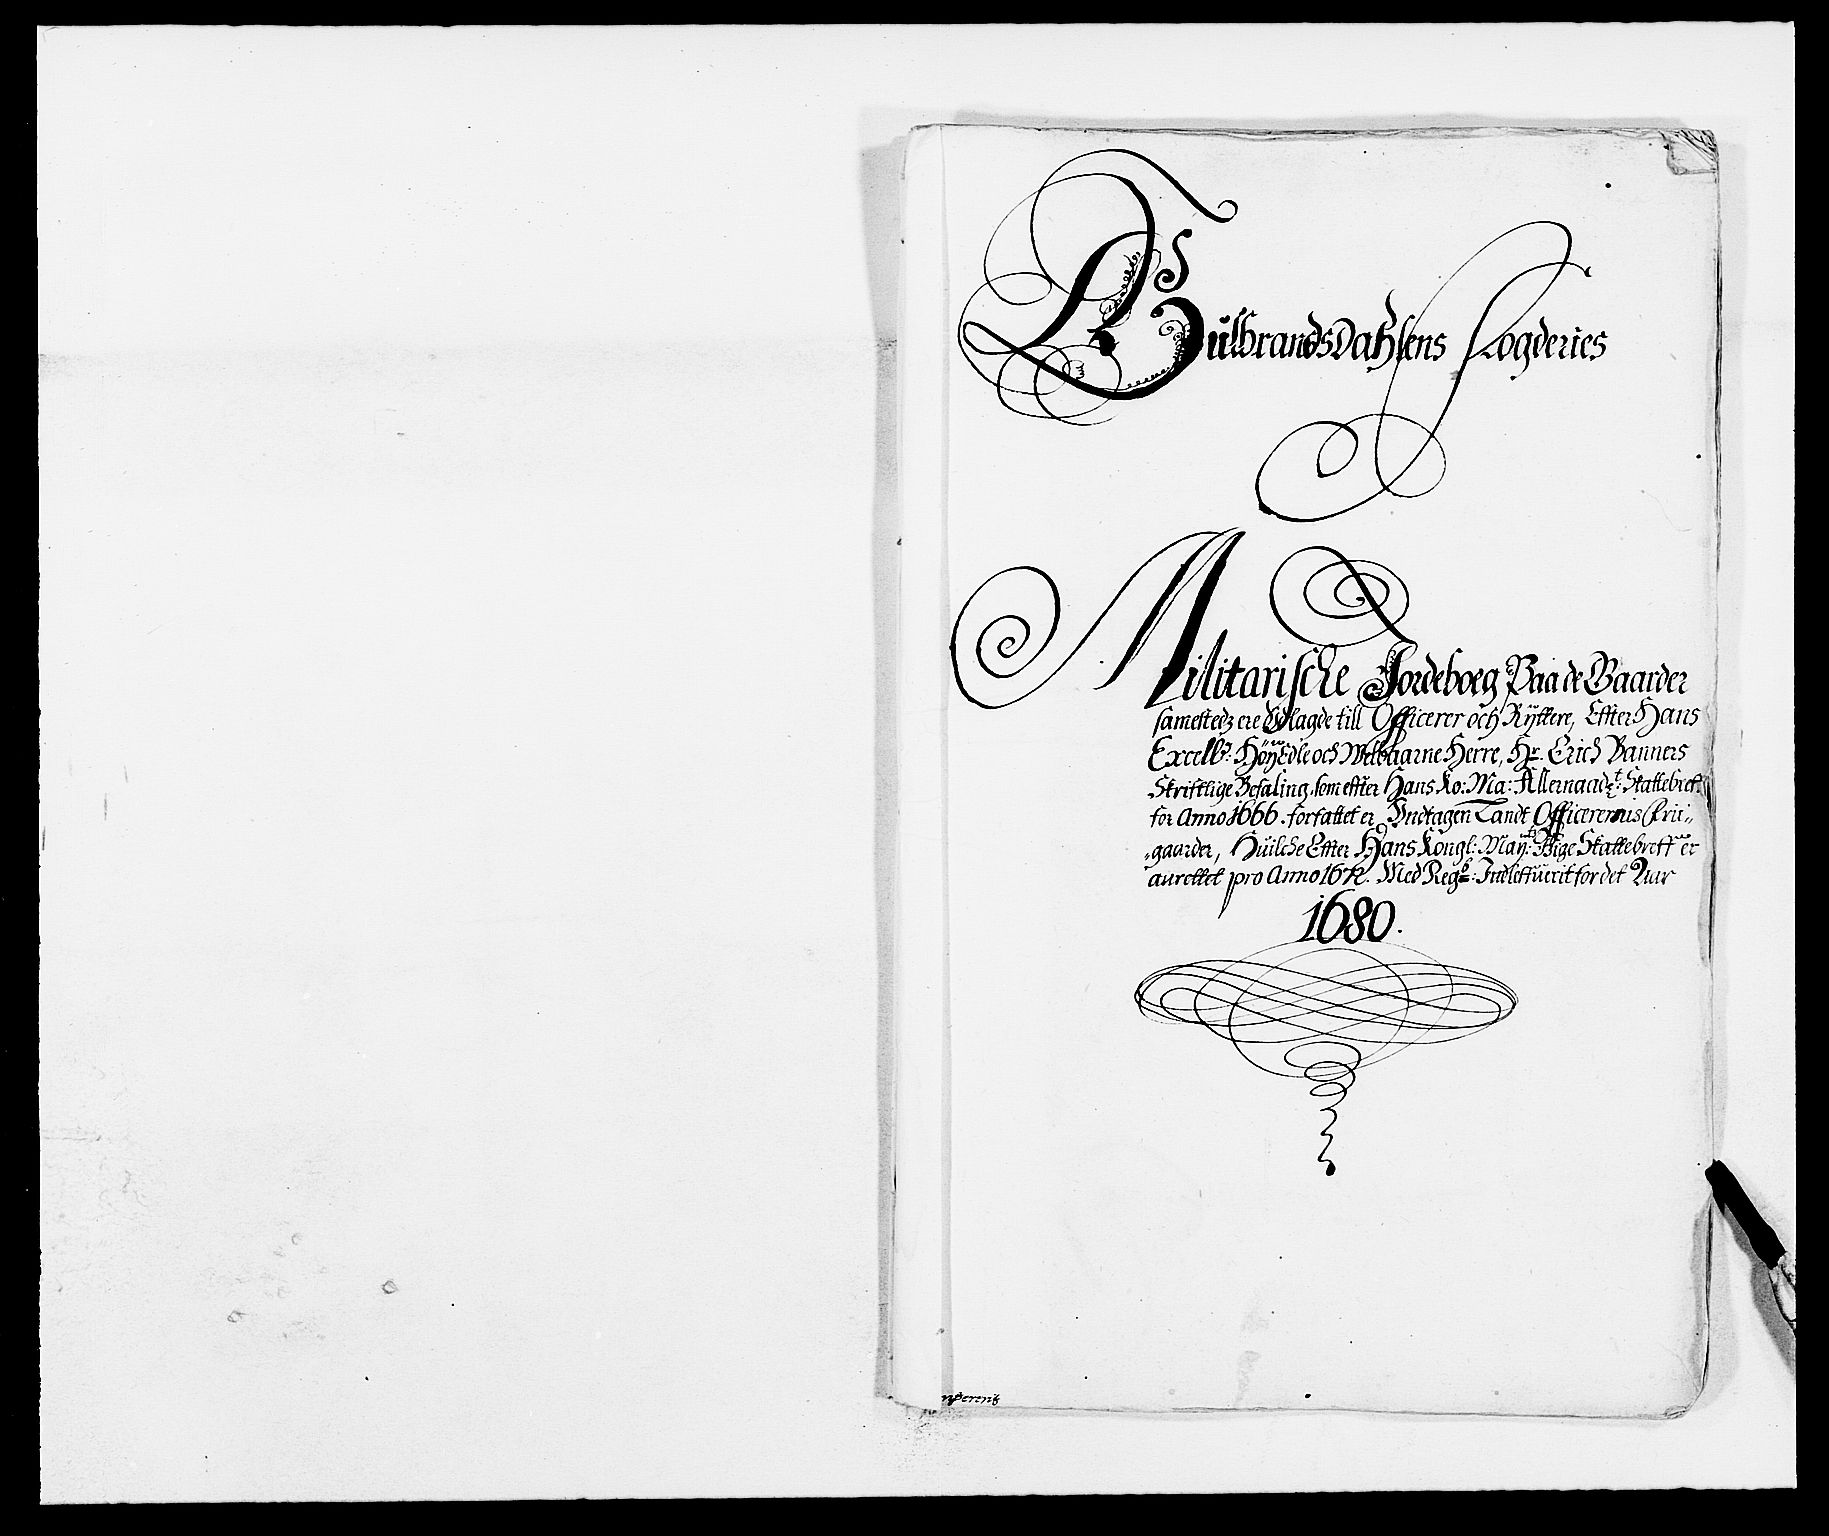 RA, Rentekammeret inntil 1814, Reviderte regnskaper, Fogderegnskap, R17/L1154: Fogderegnskap Gudbrandsdal, 1680, s. 394